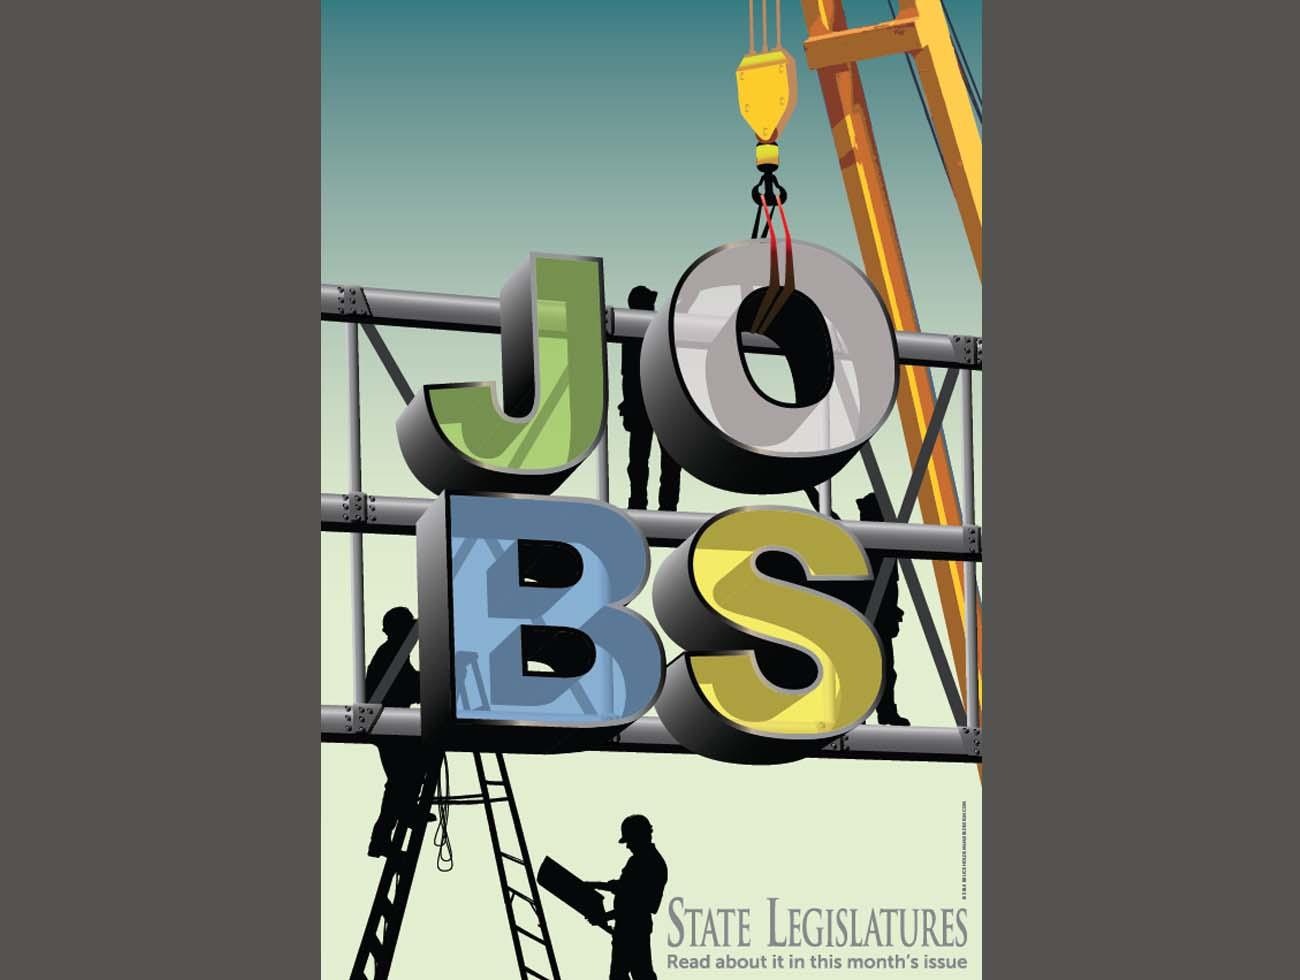 Poster on job growth